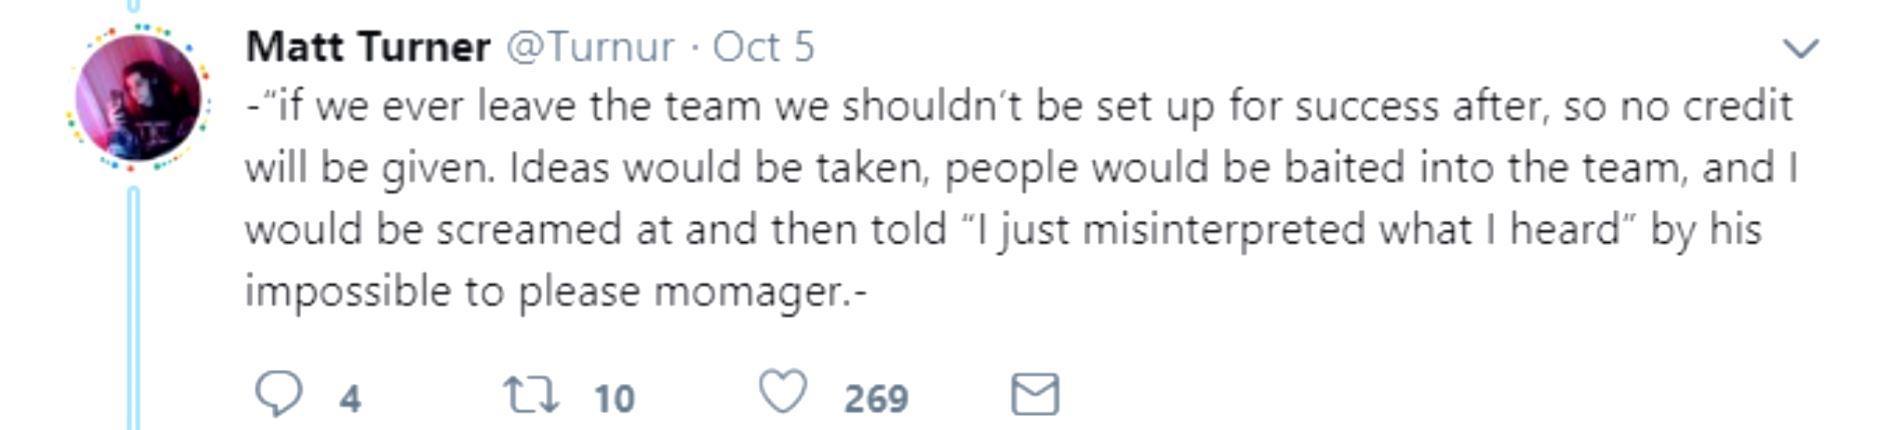 Turner, Twitter / Drama Alert, YouTube